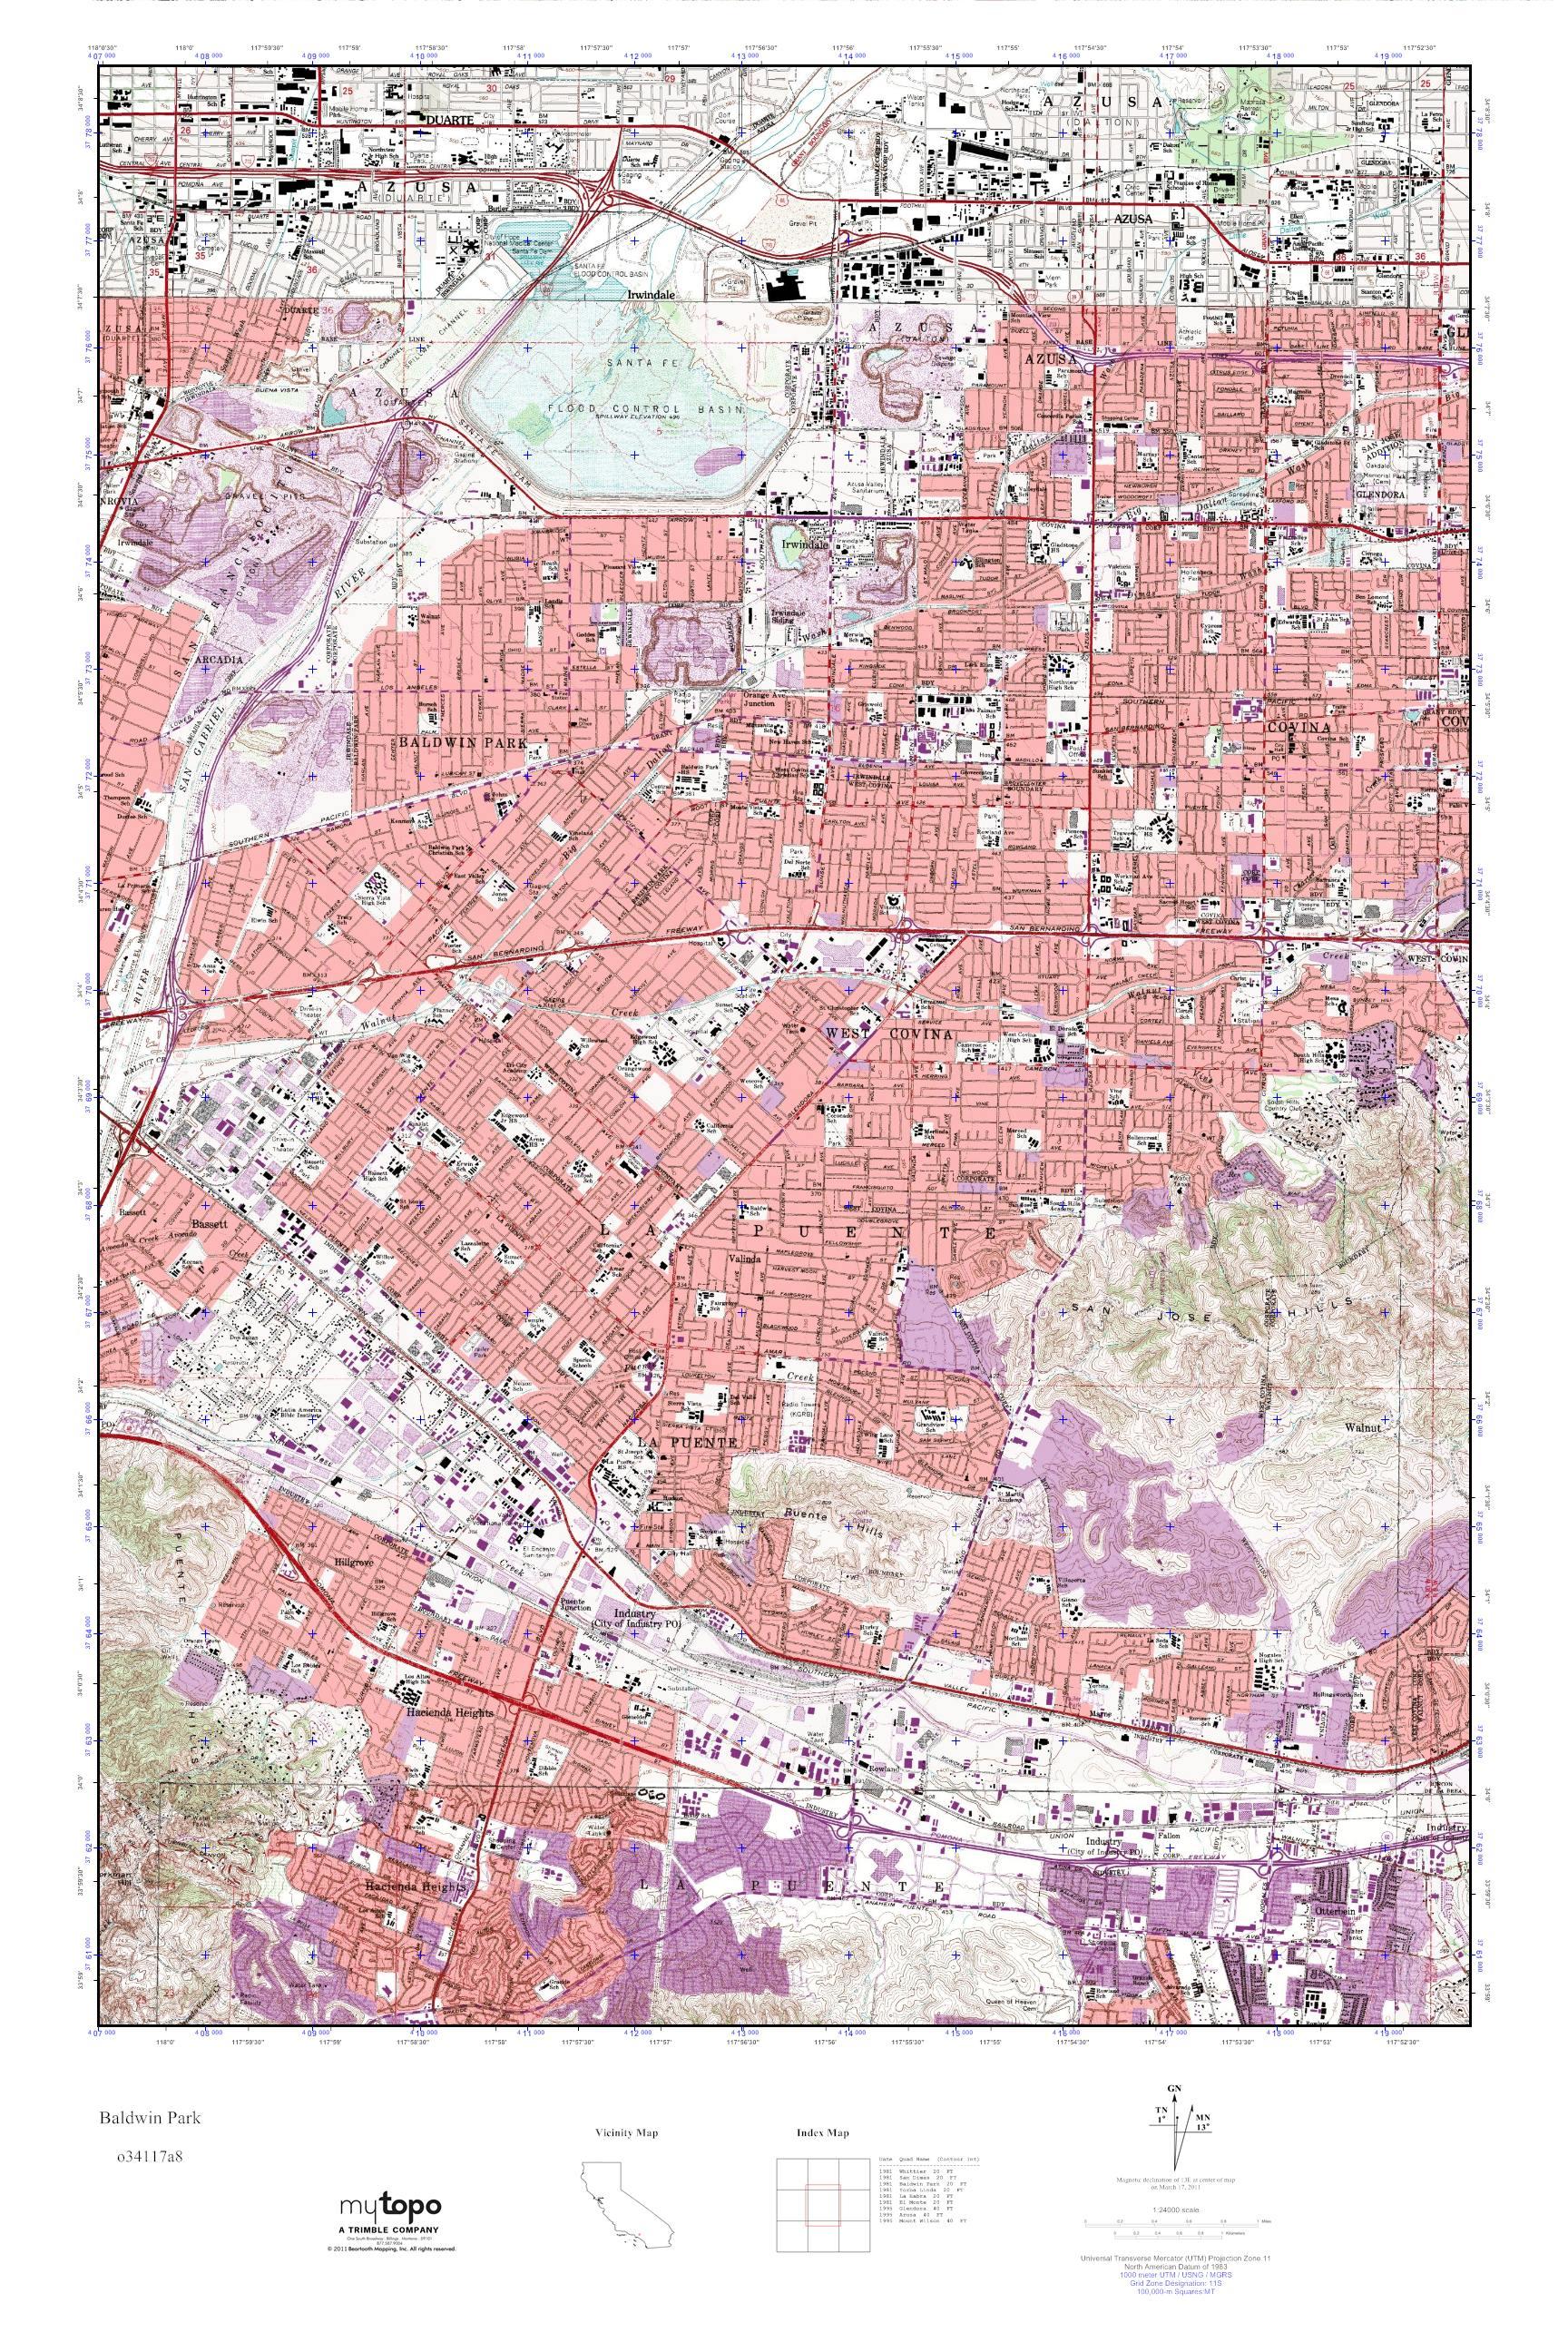 MyTopo Baldwin Park, California USGS Quad Topo Map